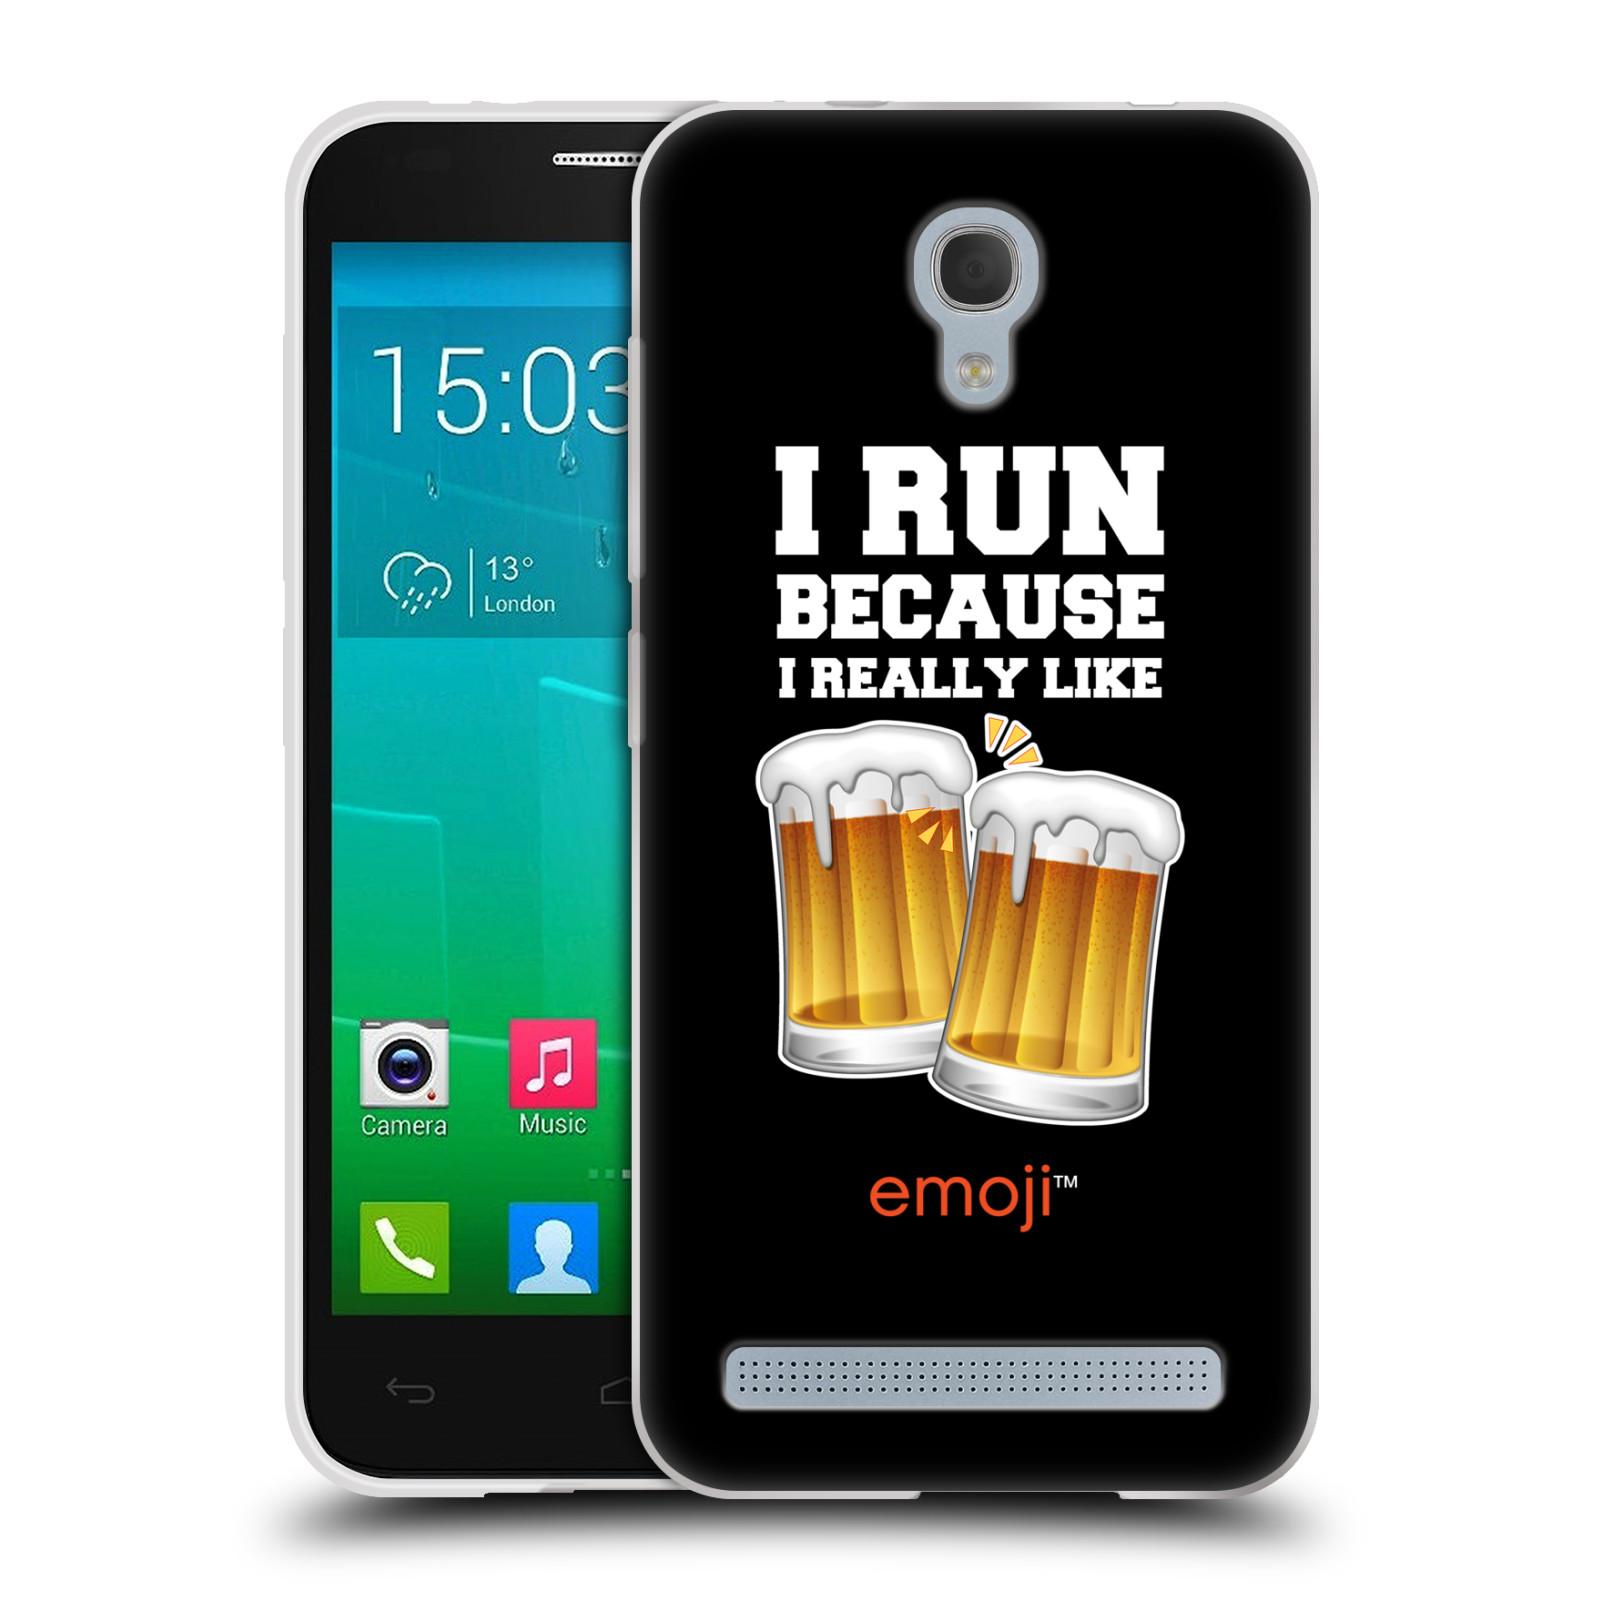 Silikonové pouzdro na mobil Alcatel One Touch Idol 2 Mini S 6036Y HEAD CASE EMOJI - Běhám na pivko (Silikonový kryt či obal s oficiálním motivem EMOJI na mobilní telefon Alcatel Idol 2 Mini S OT-6036Y)